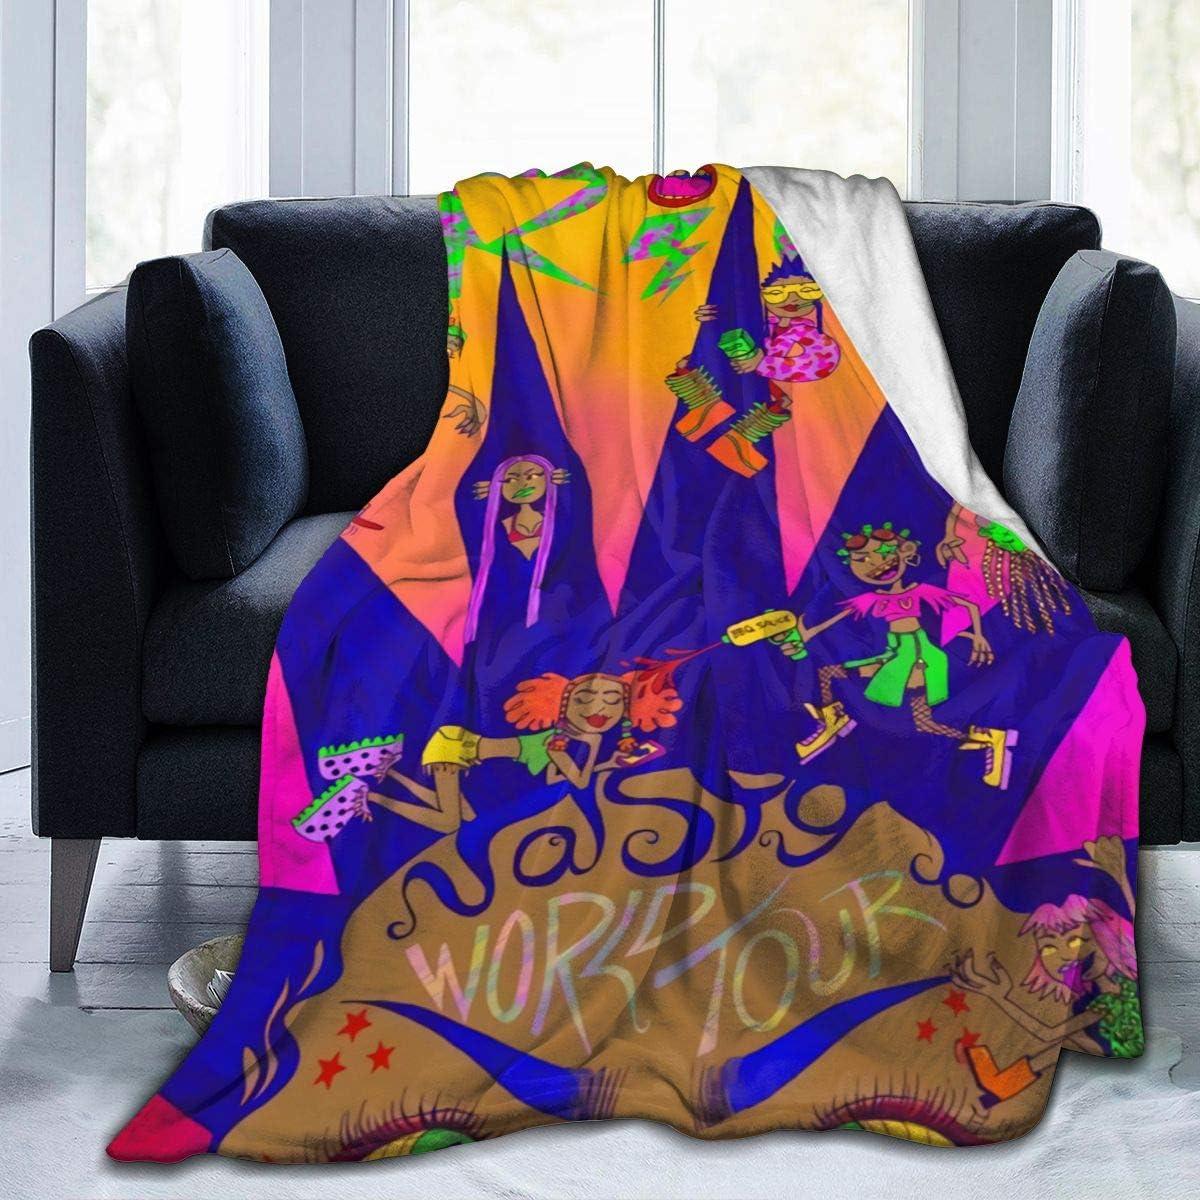 MarySPersds 新品未使用正規品 RICO Nasty Blankets Warm Flannel Soft 上質 Super